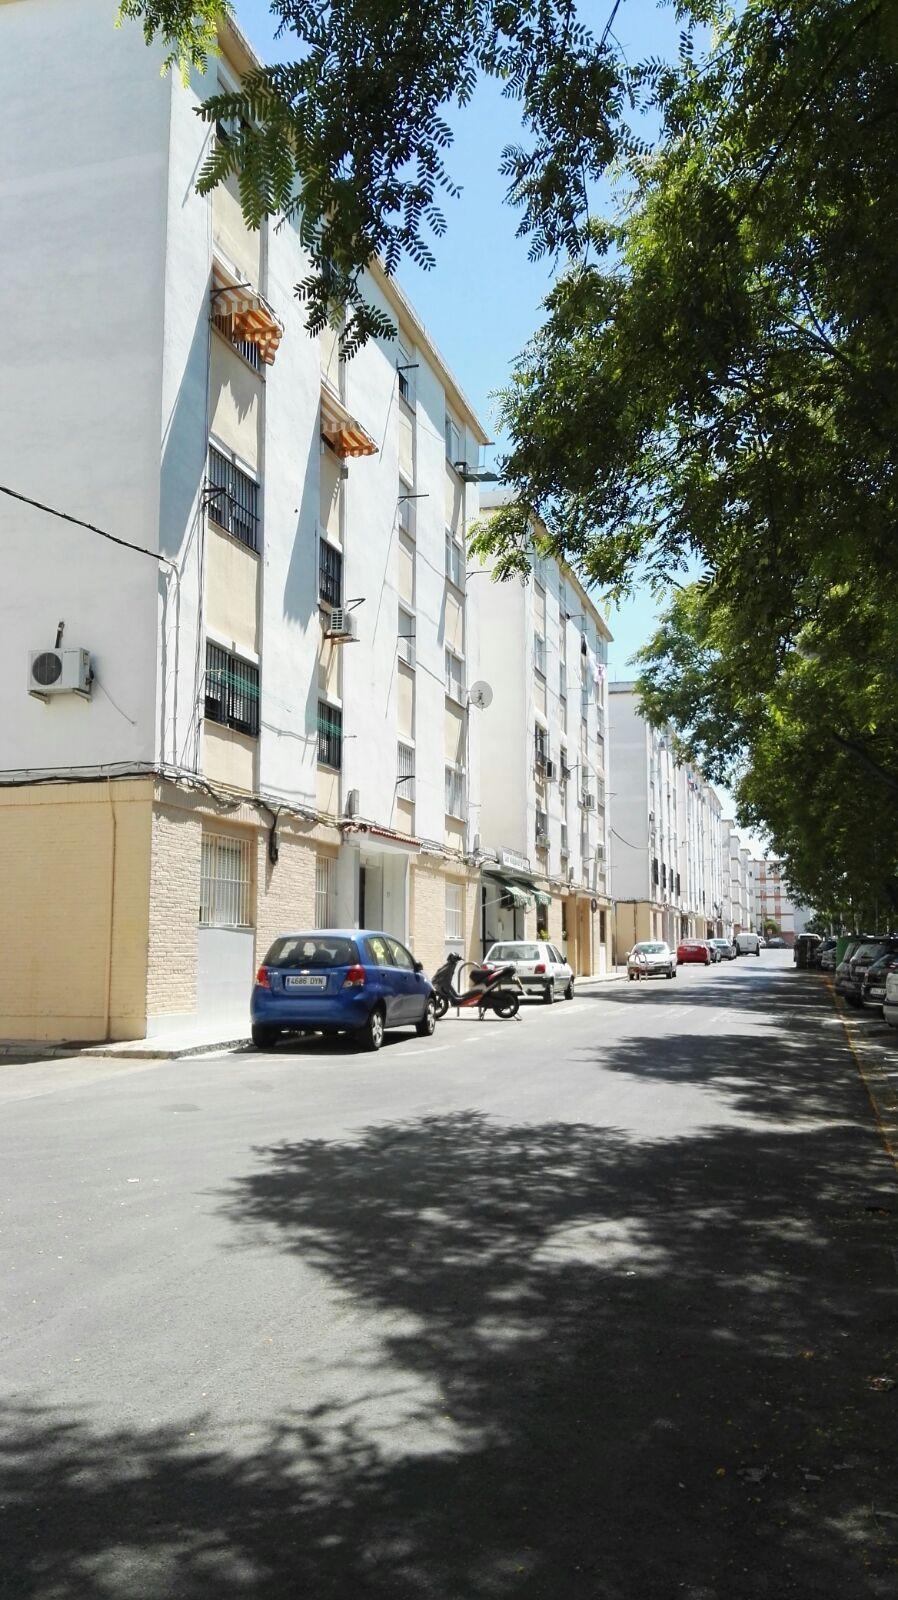 Piso en Jerez de la Frontera, OESTE, venta